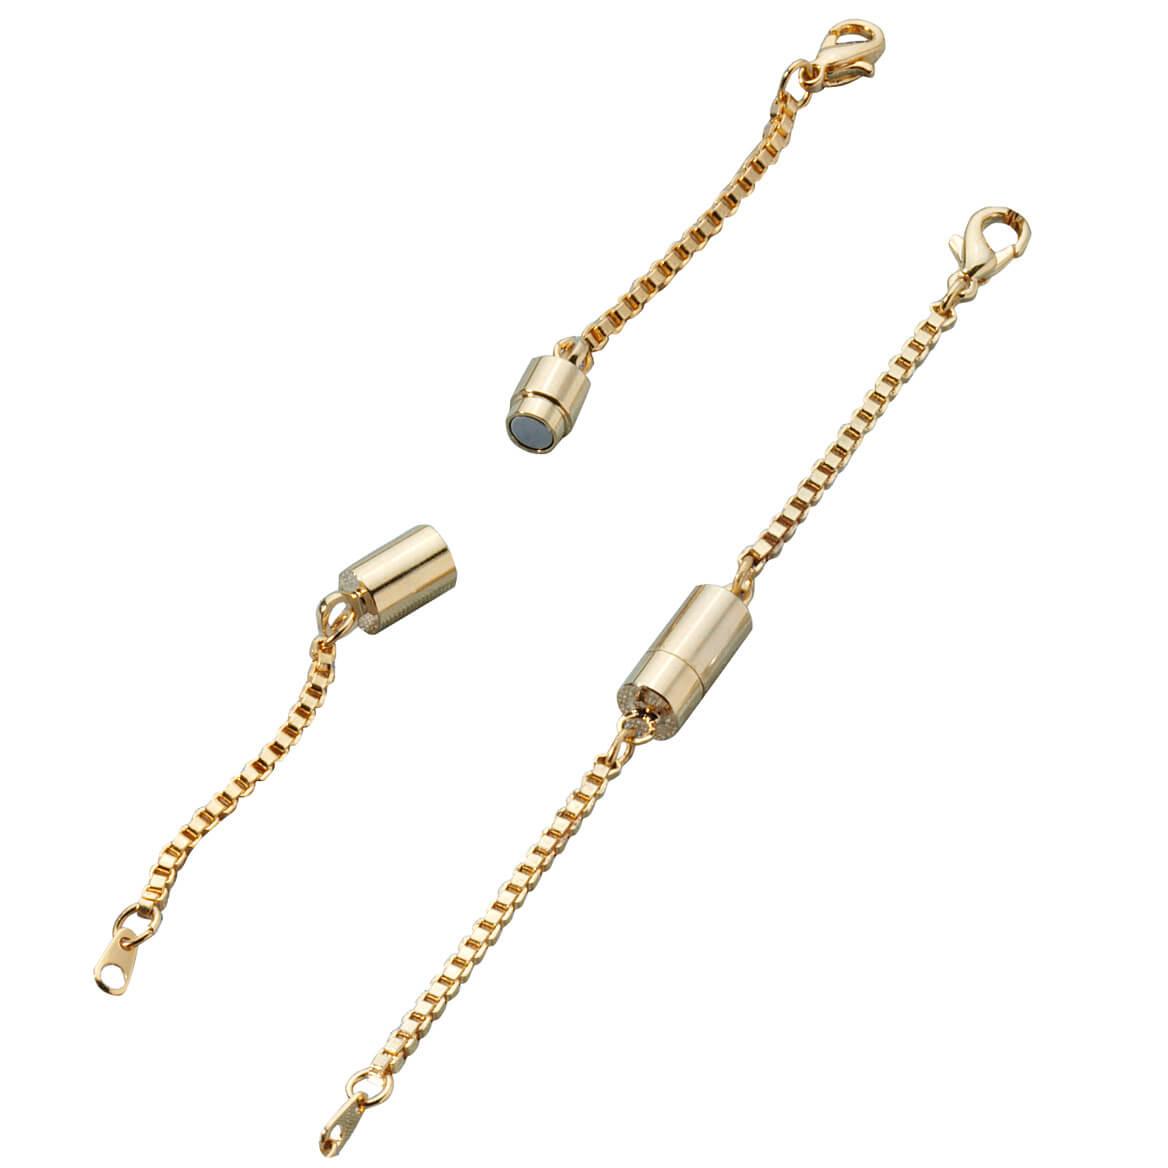 Magnetic Necklace Extender Set of 2